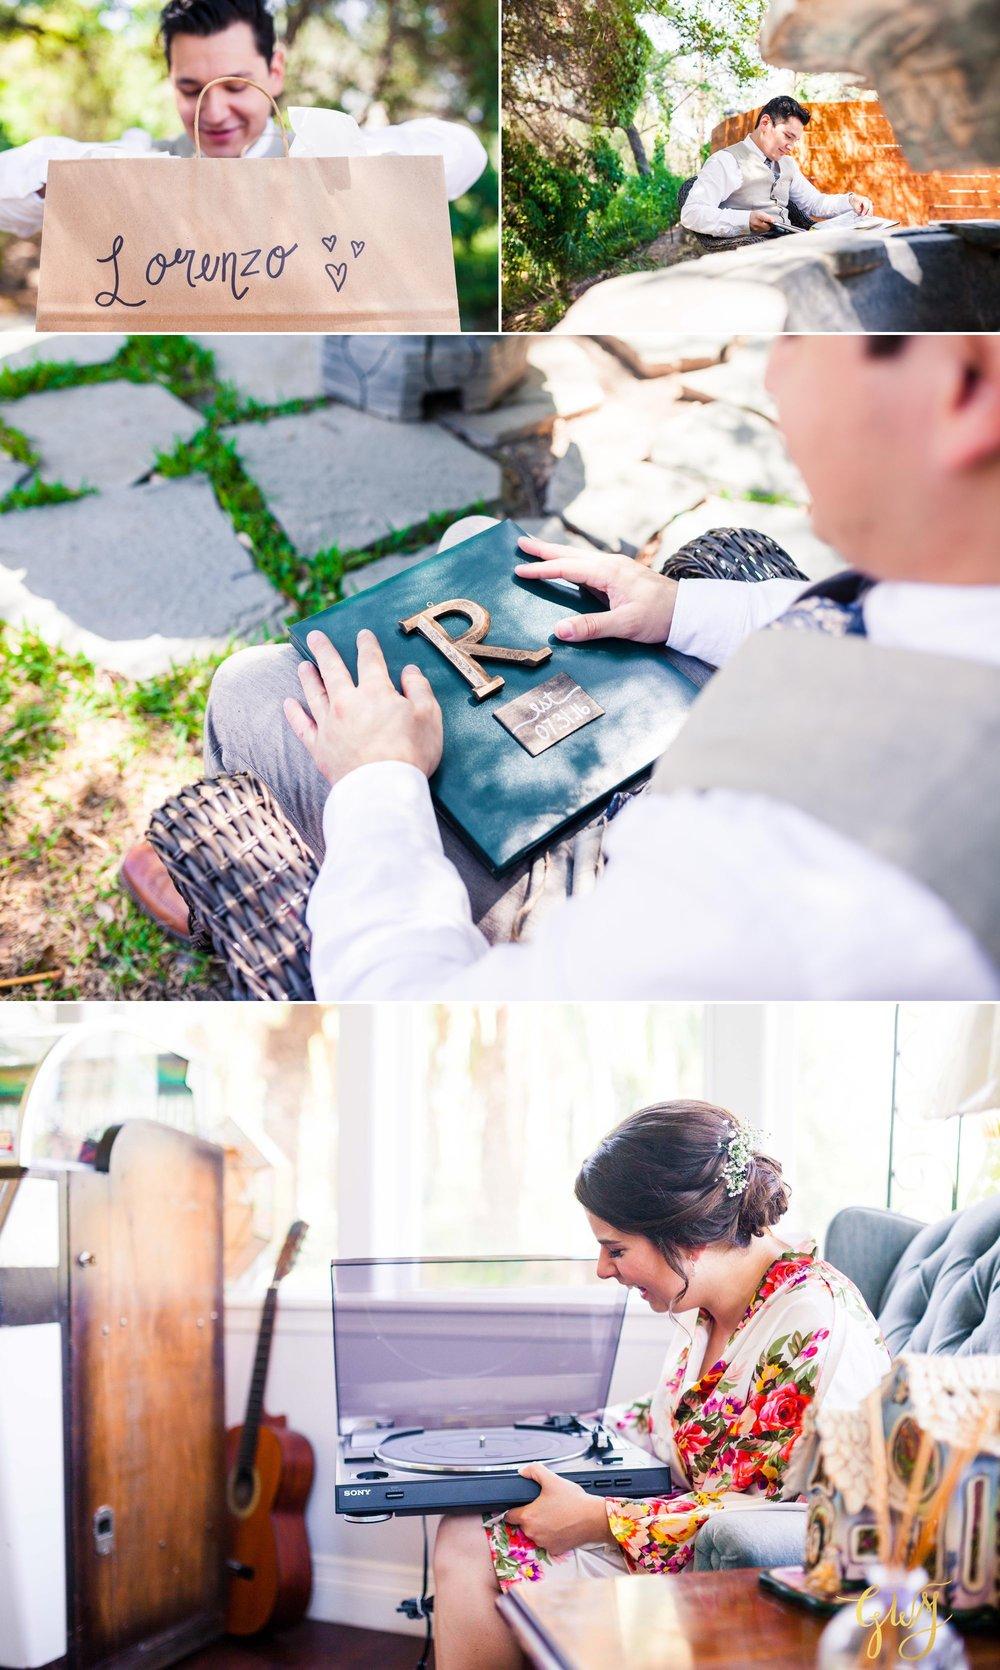 Hannah + Lorenzo Secluded Garden Estate Temecula DIY Wedding by Glass Woods Media 7.jpg